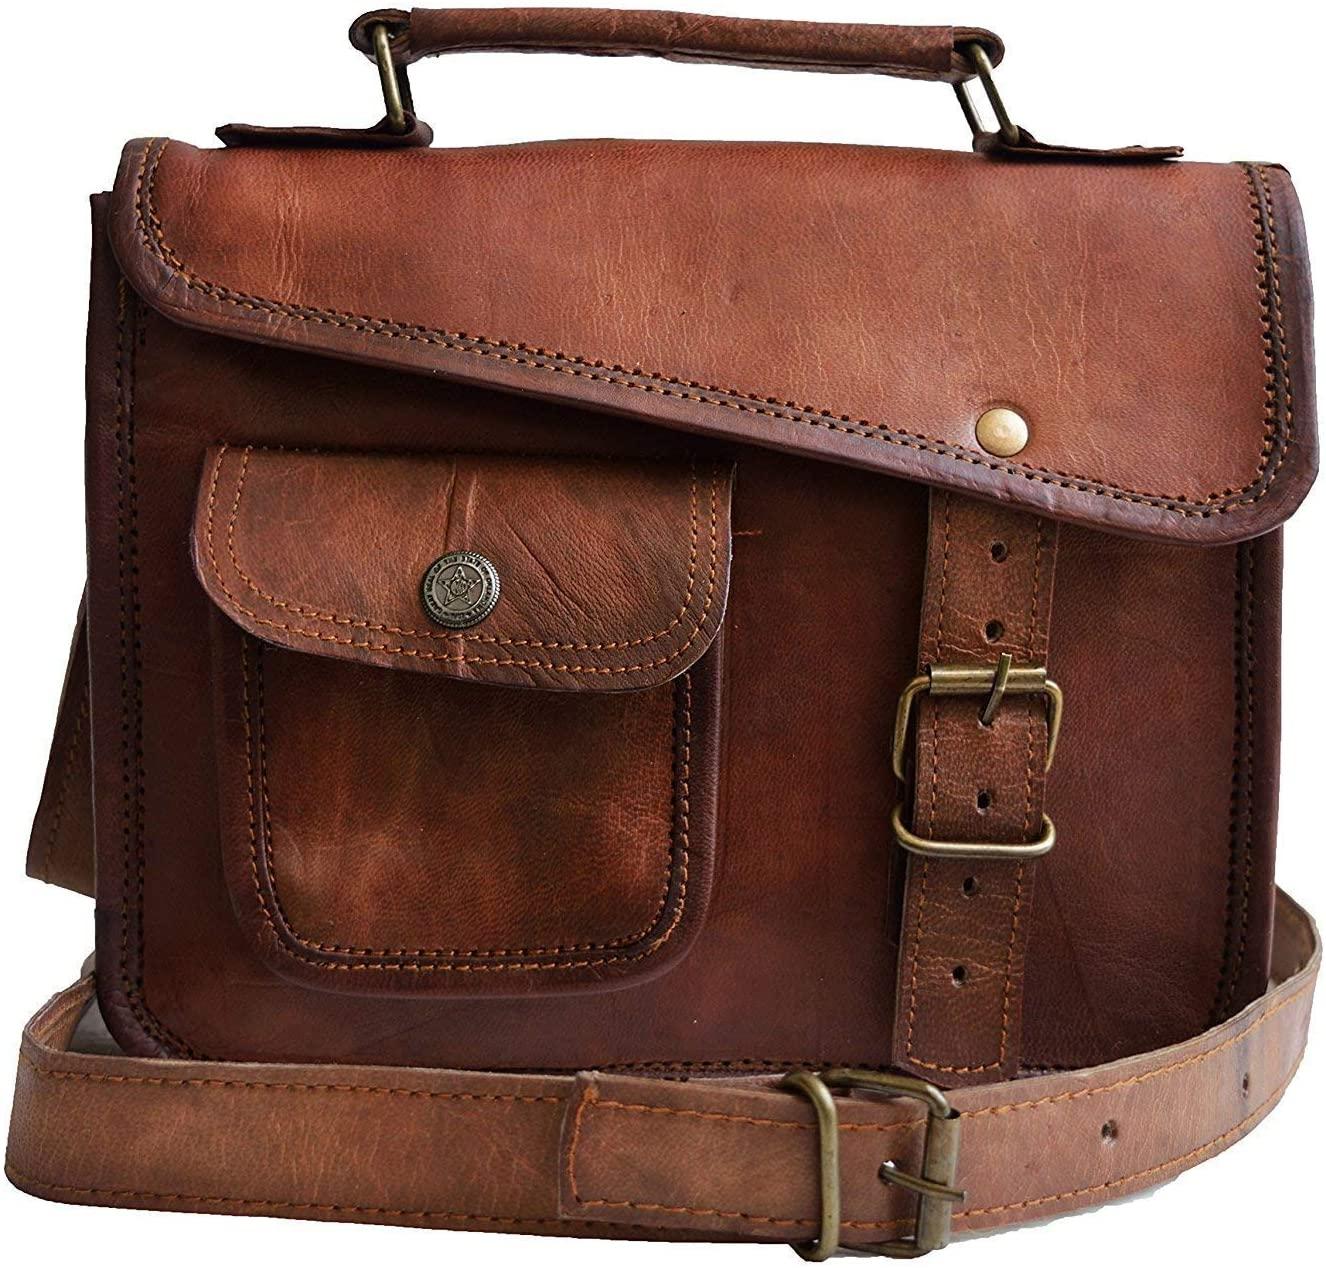 Stellar Styles Genuine Leather Messenger laptop school purse shoulder vintage cross body bag